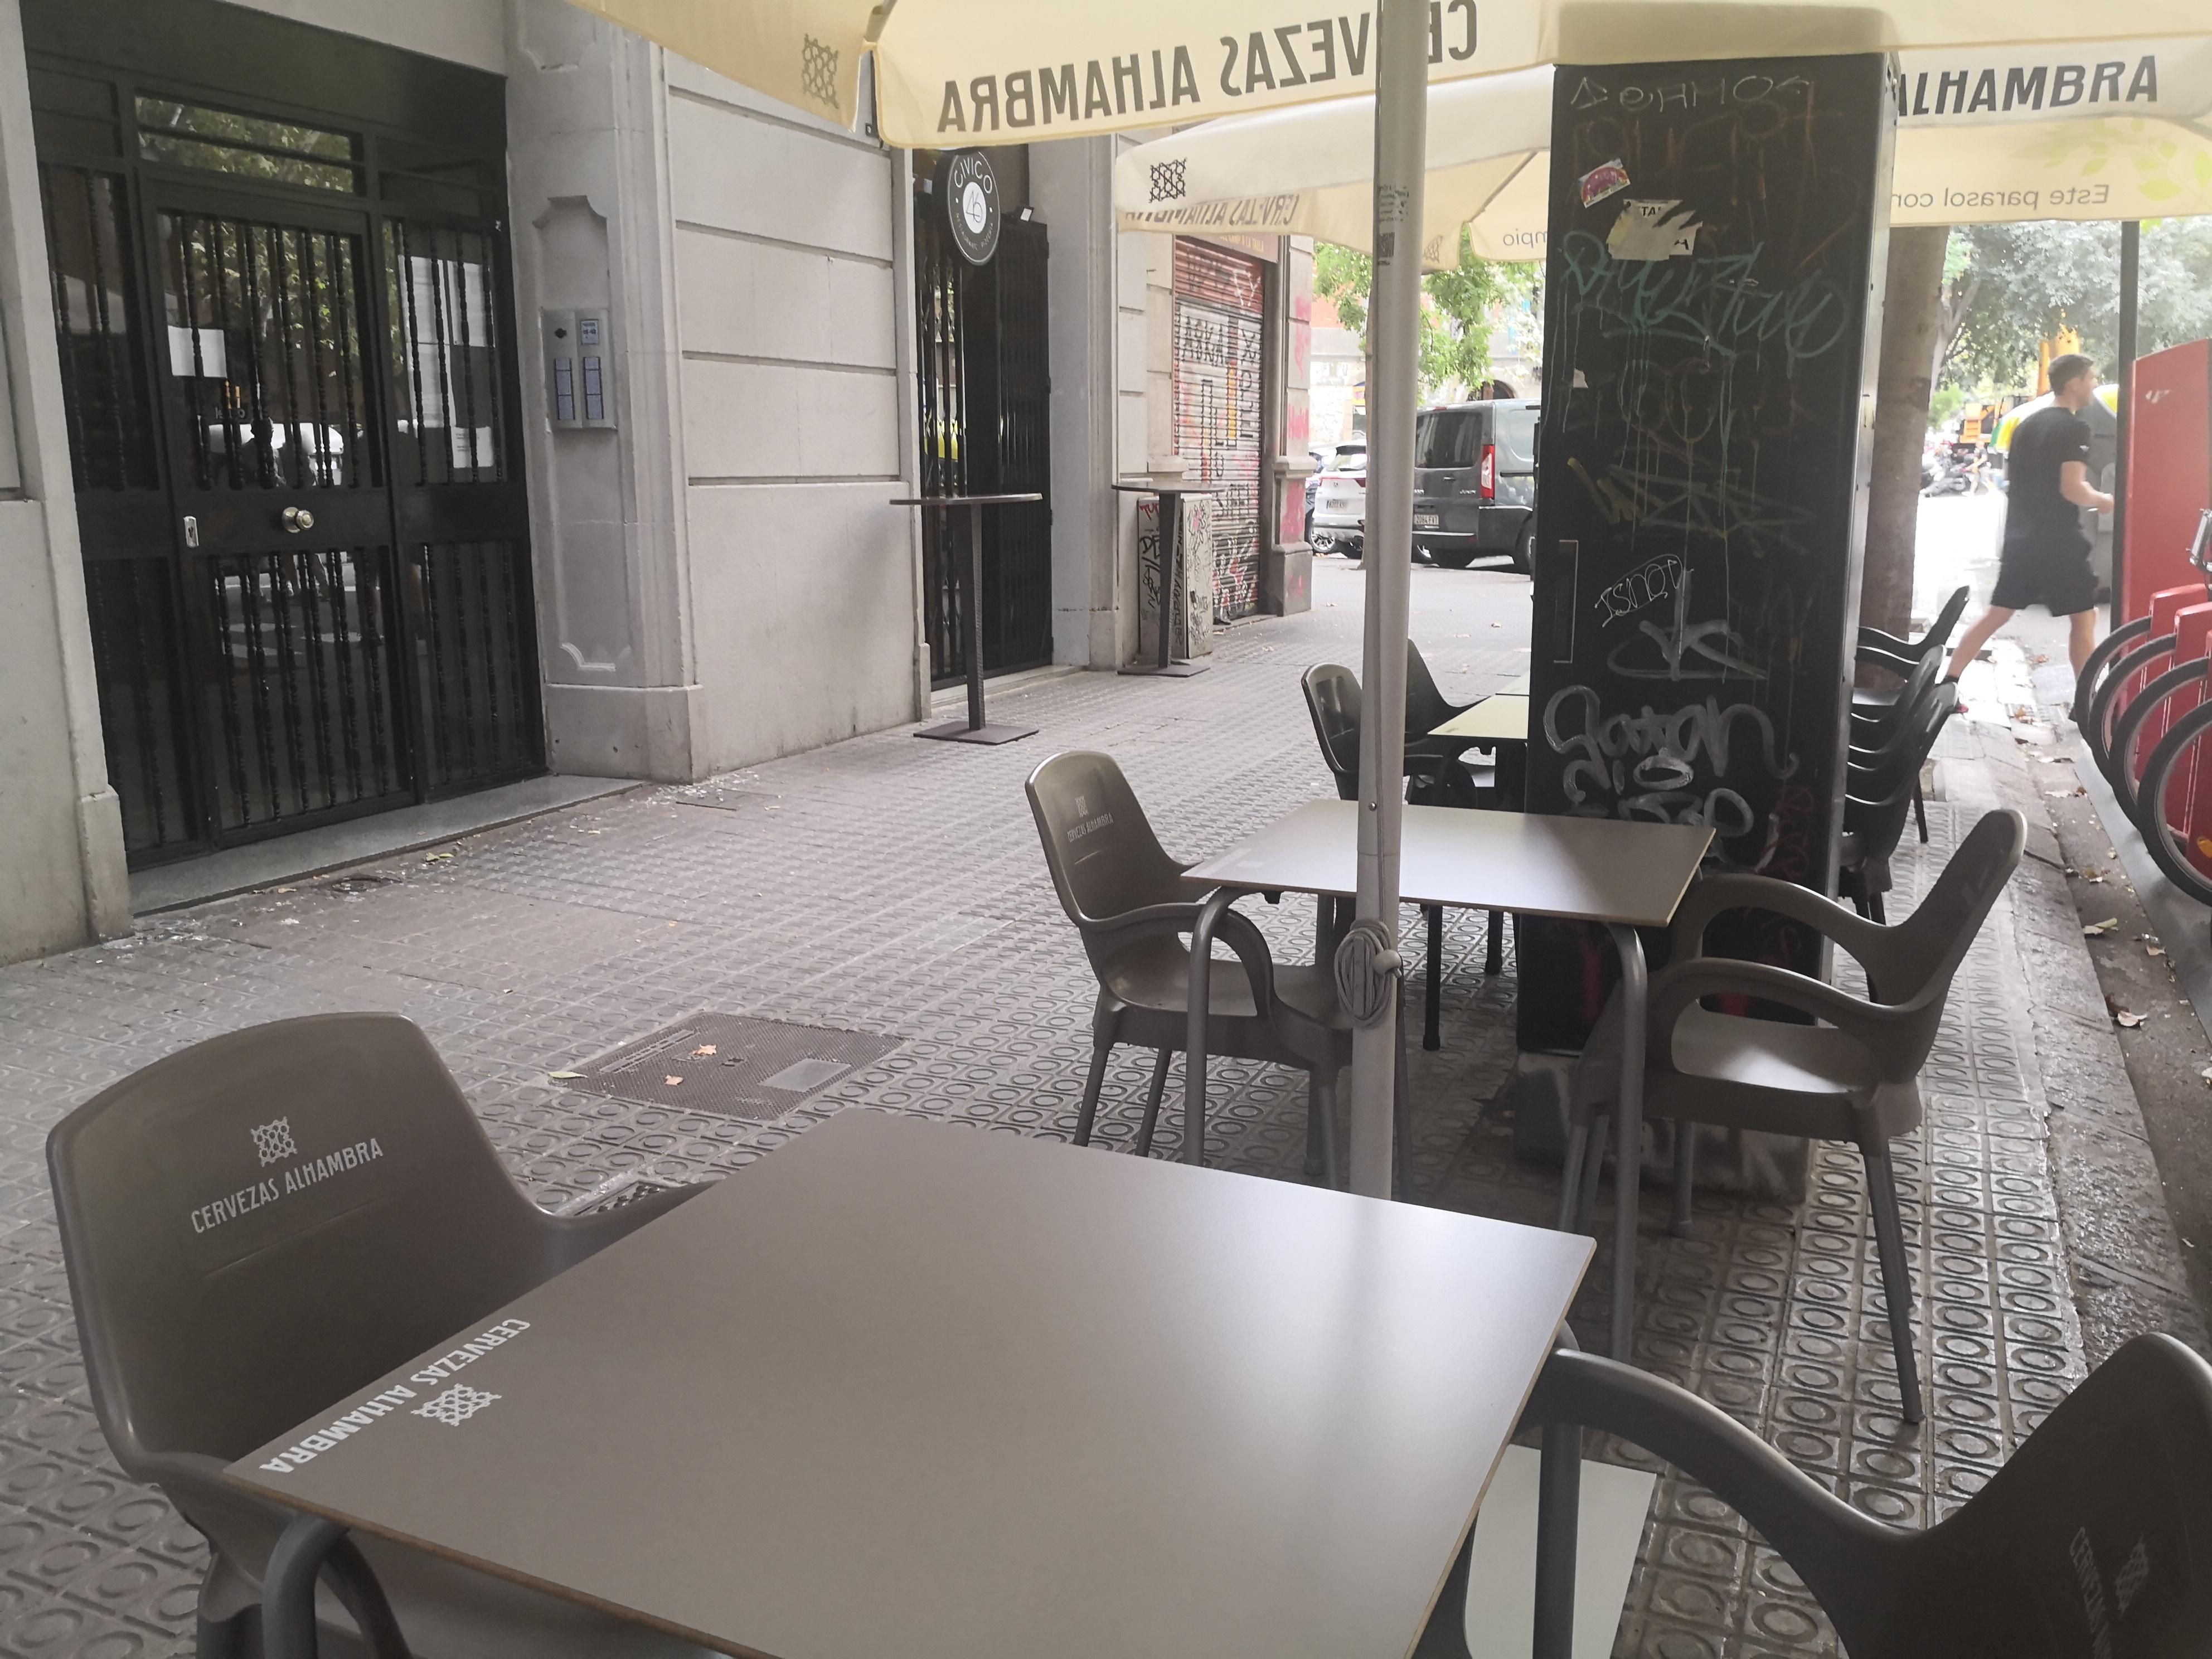 Manso, 46 - més taules il·legals en façana!!